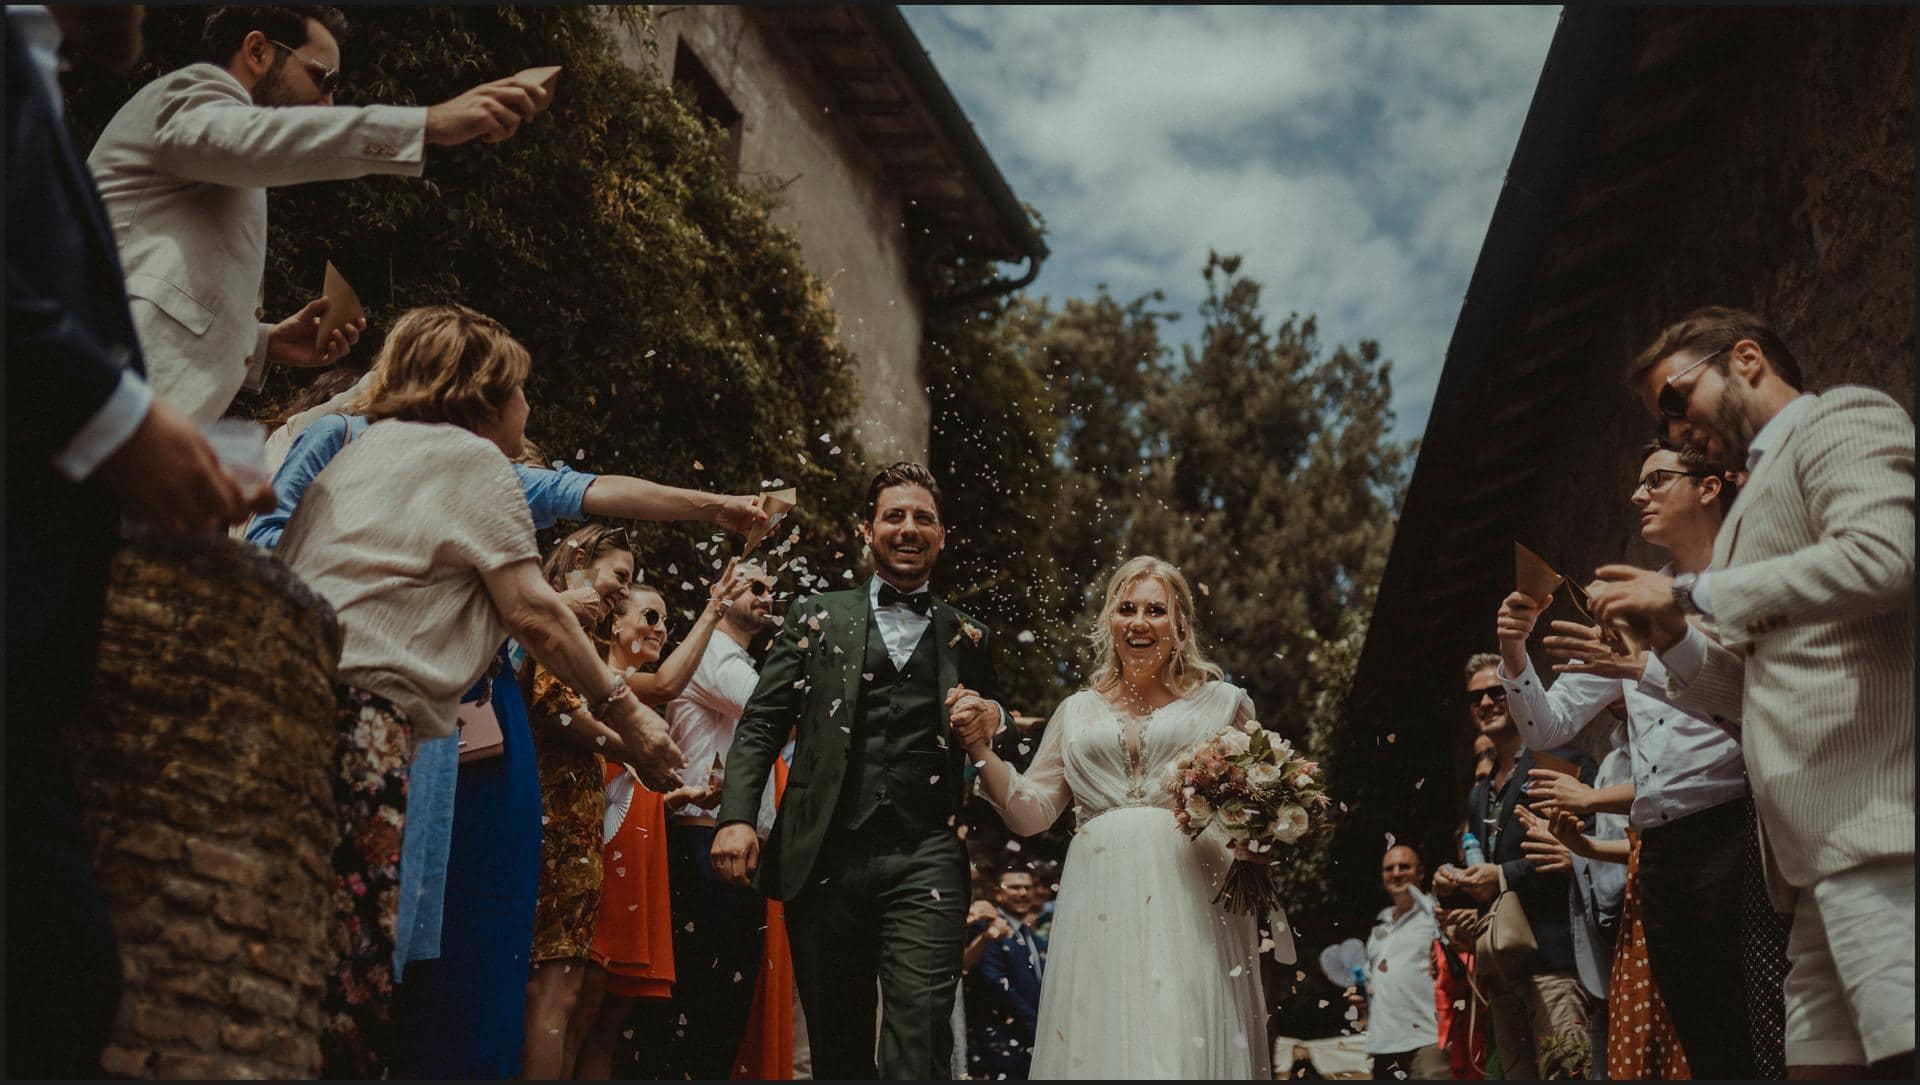 borgo di tragliata, wedding, rome, wedding in rome, rice toss, wedding in italy